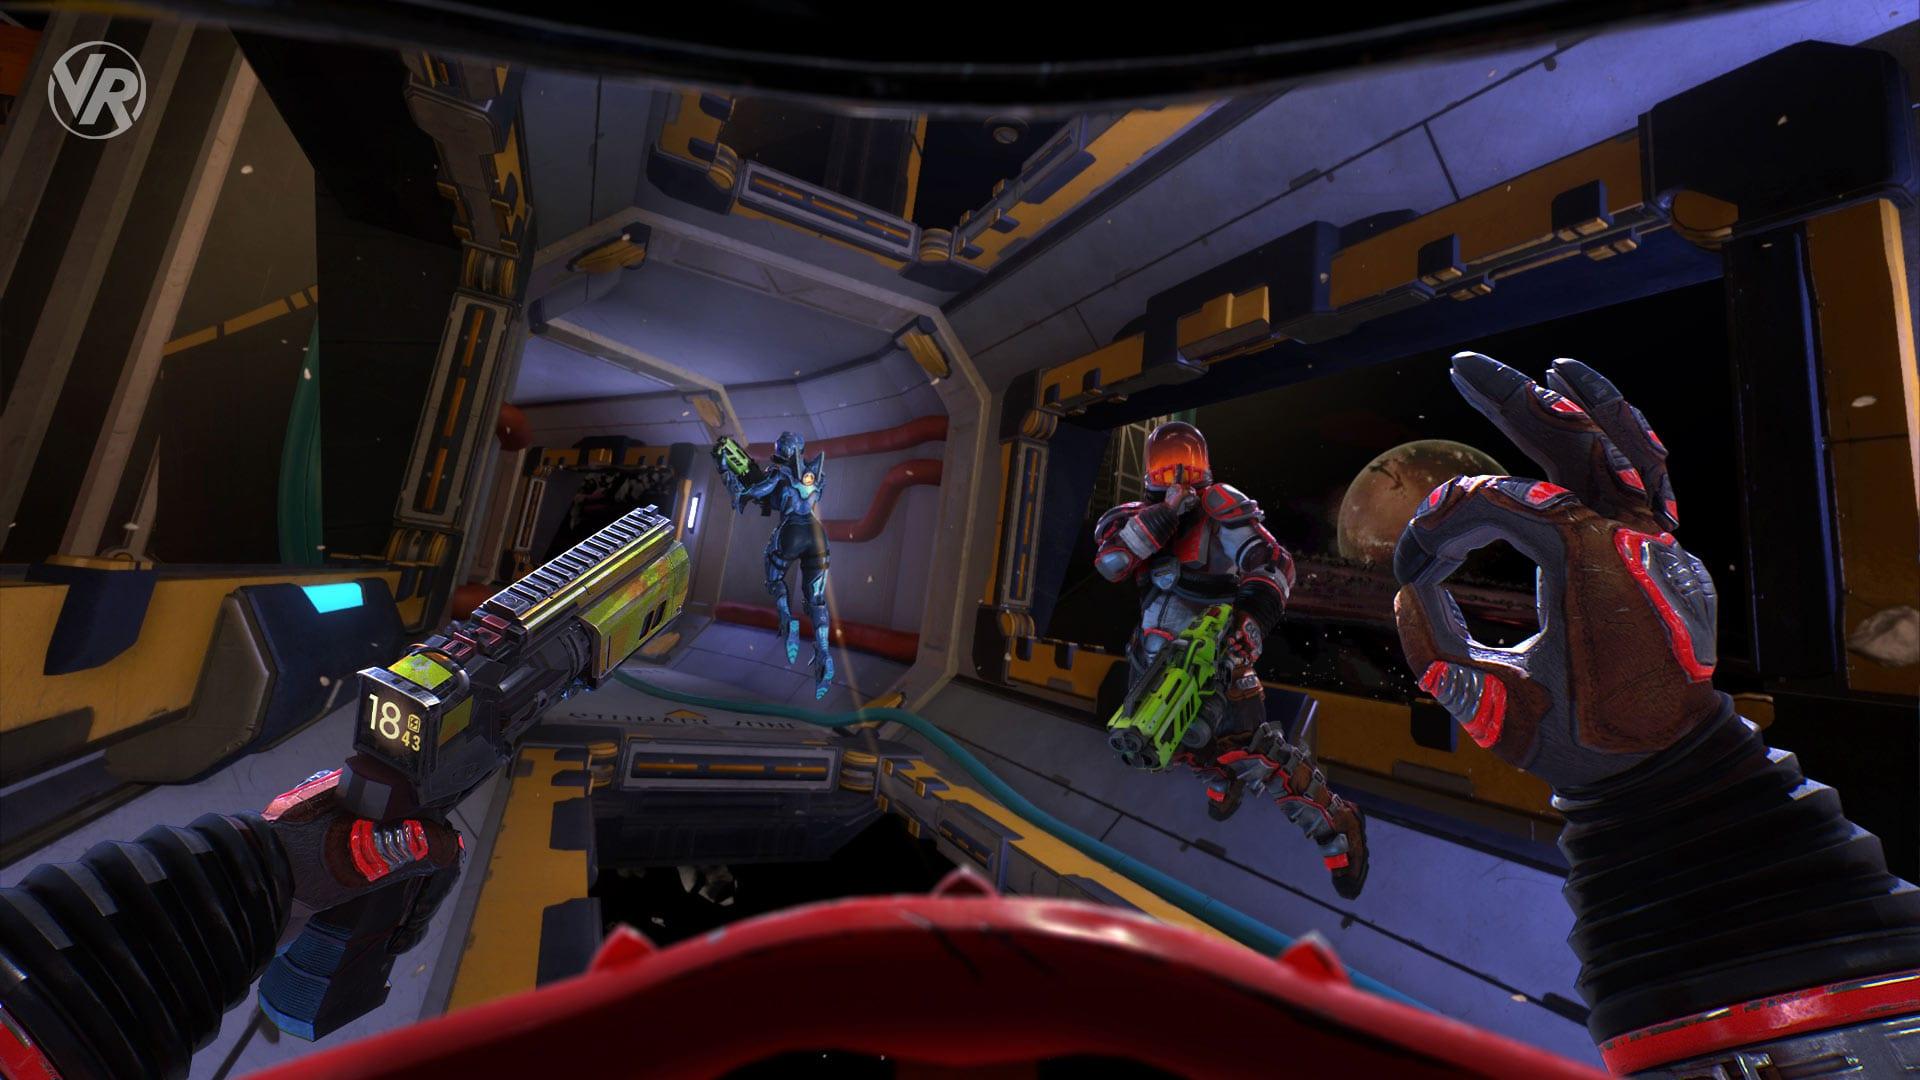 space junkies, vr, PSVR, HTC Vive, Oculus Rift